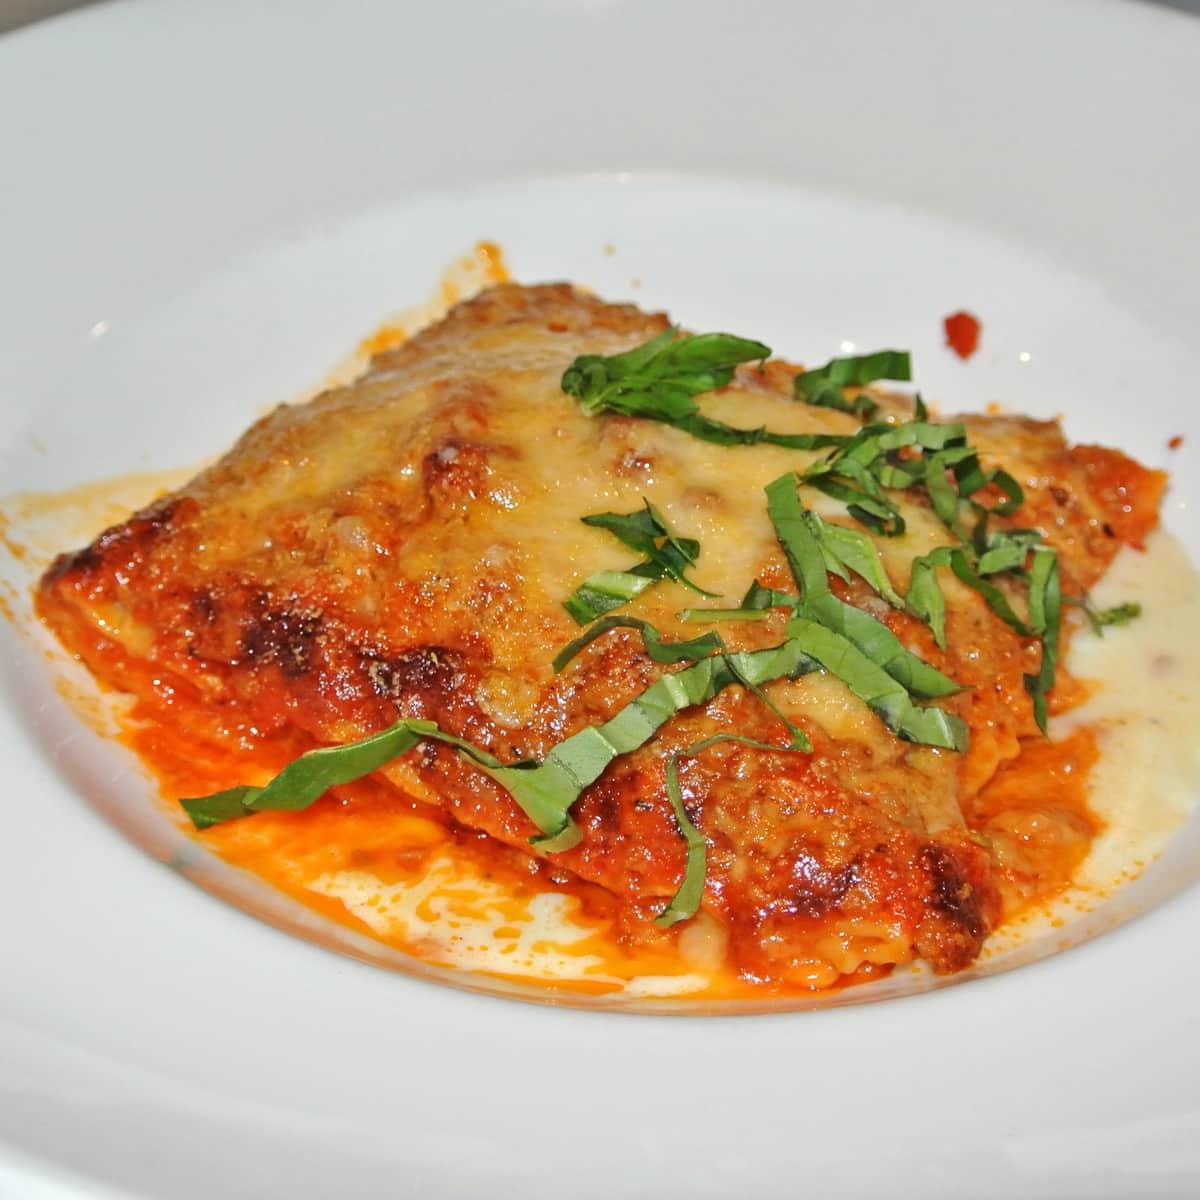 Vero Is Where the Palo Alto Locals Go For A Homey Italian Meal